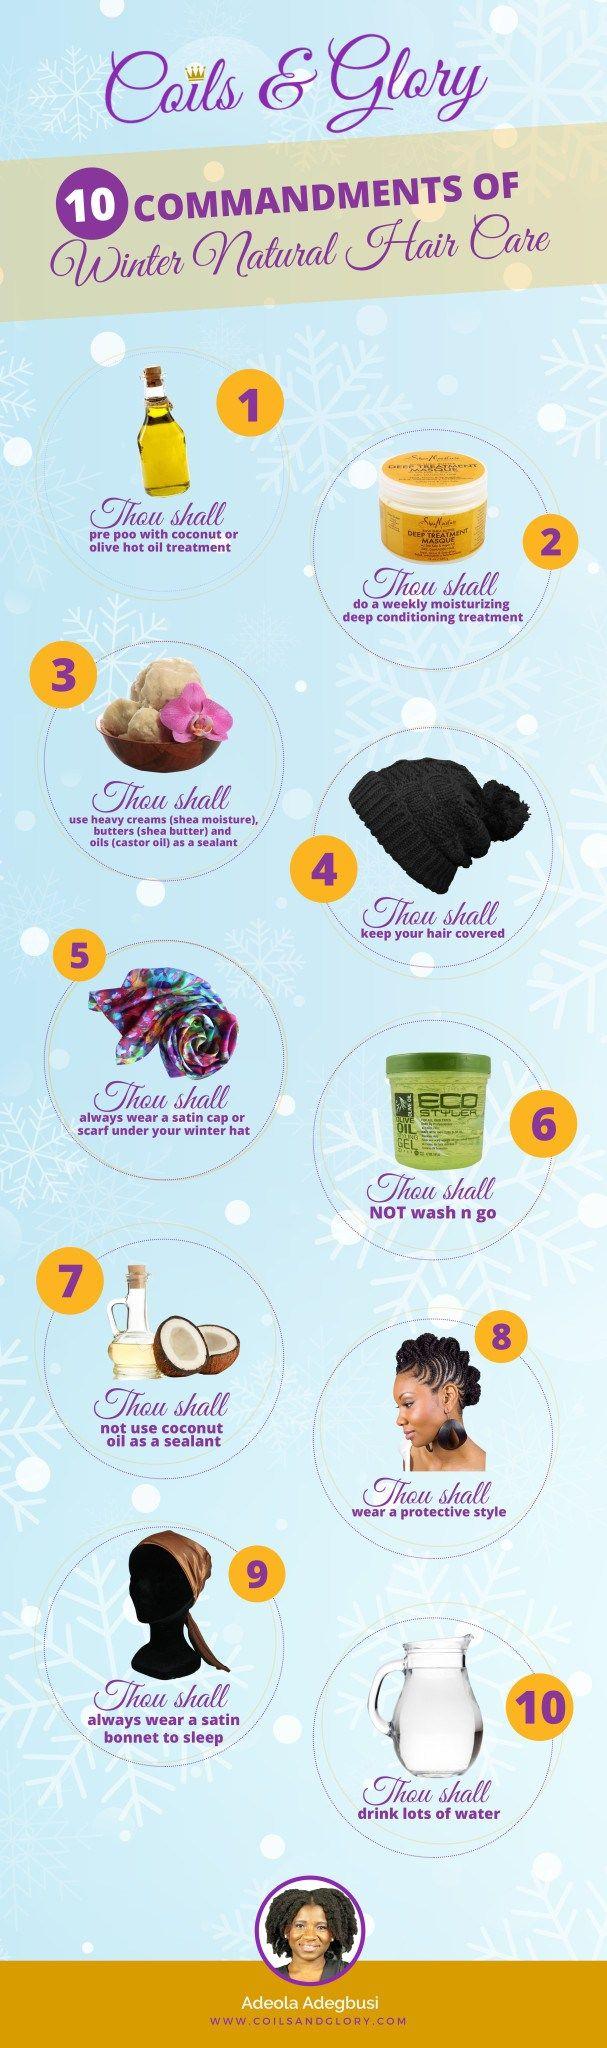 10 Commandments of Winter Natural Hair Care